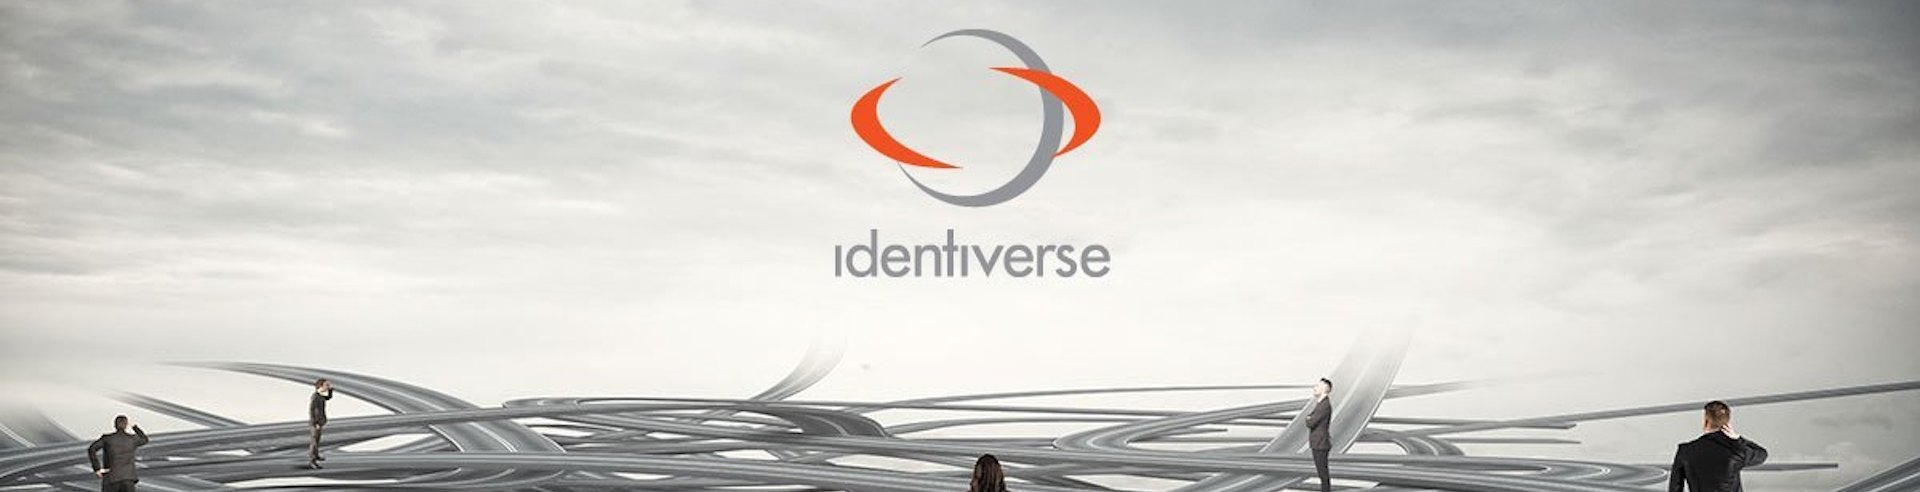 Identiverse